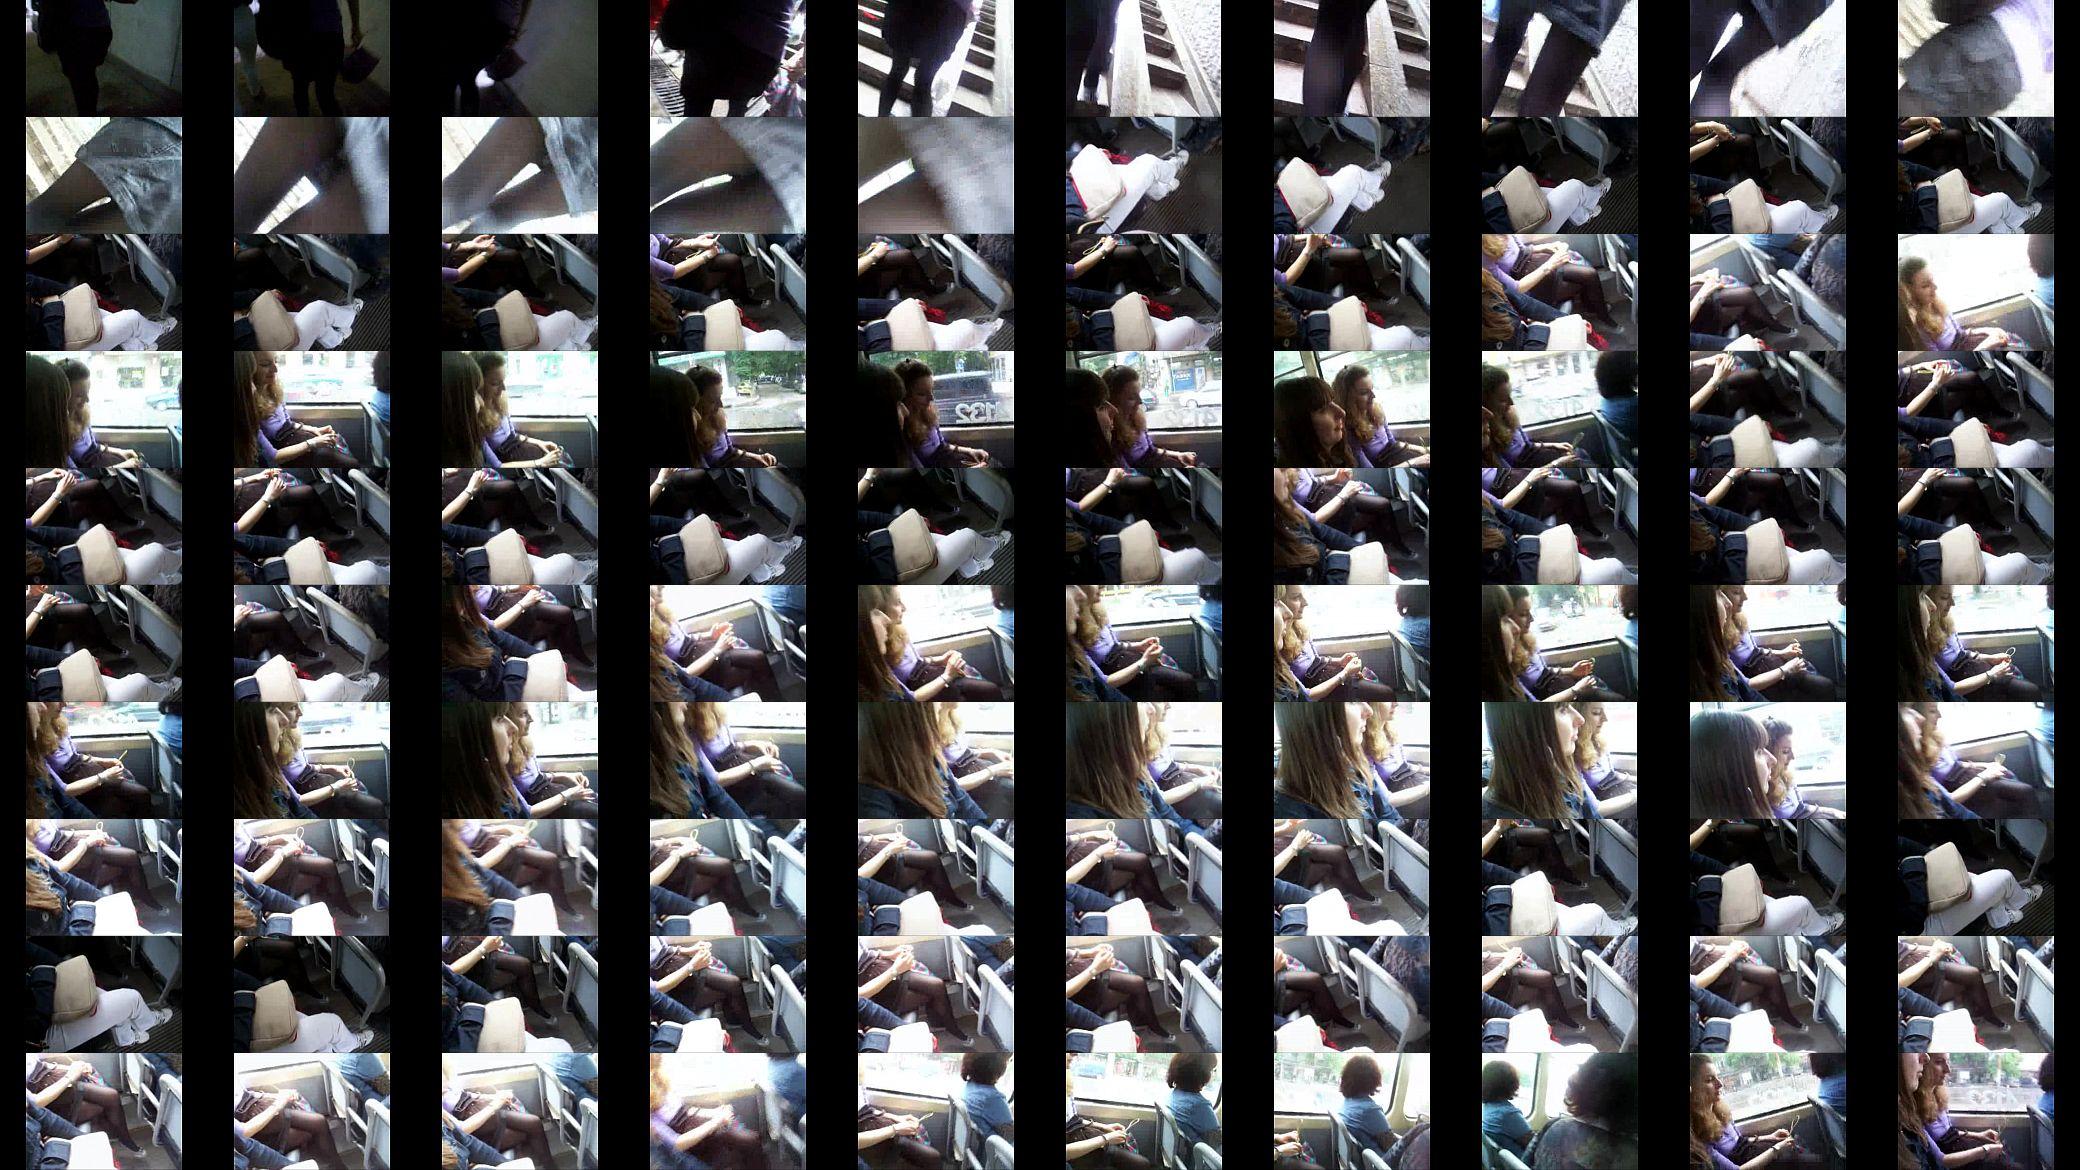 Agachadas En La Biblioteca Porno bulgarian teen upskirt - xvideos